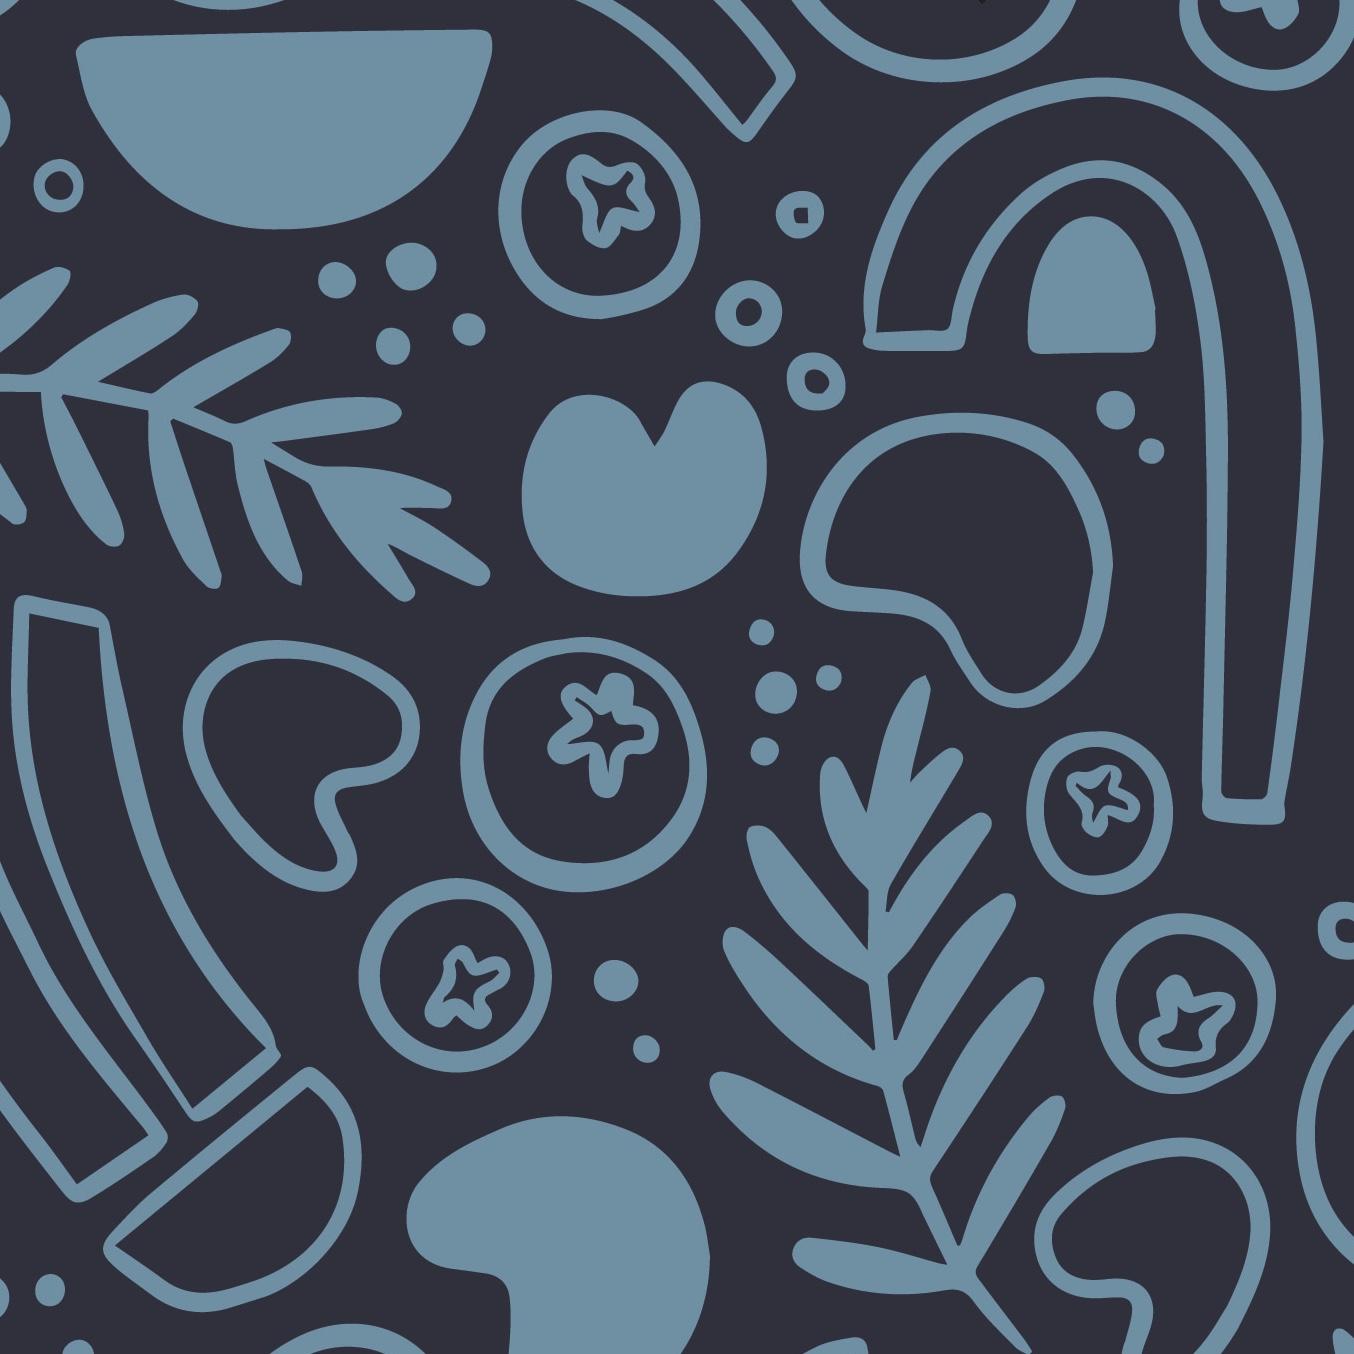 Ciocco & Co. Pattern (Acai Blueberry)